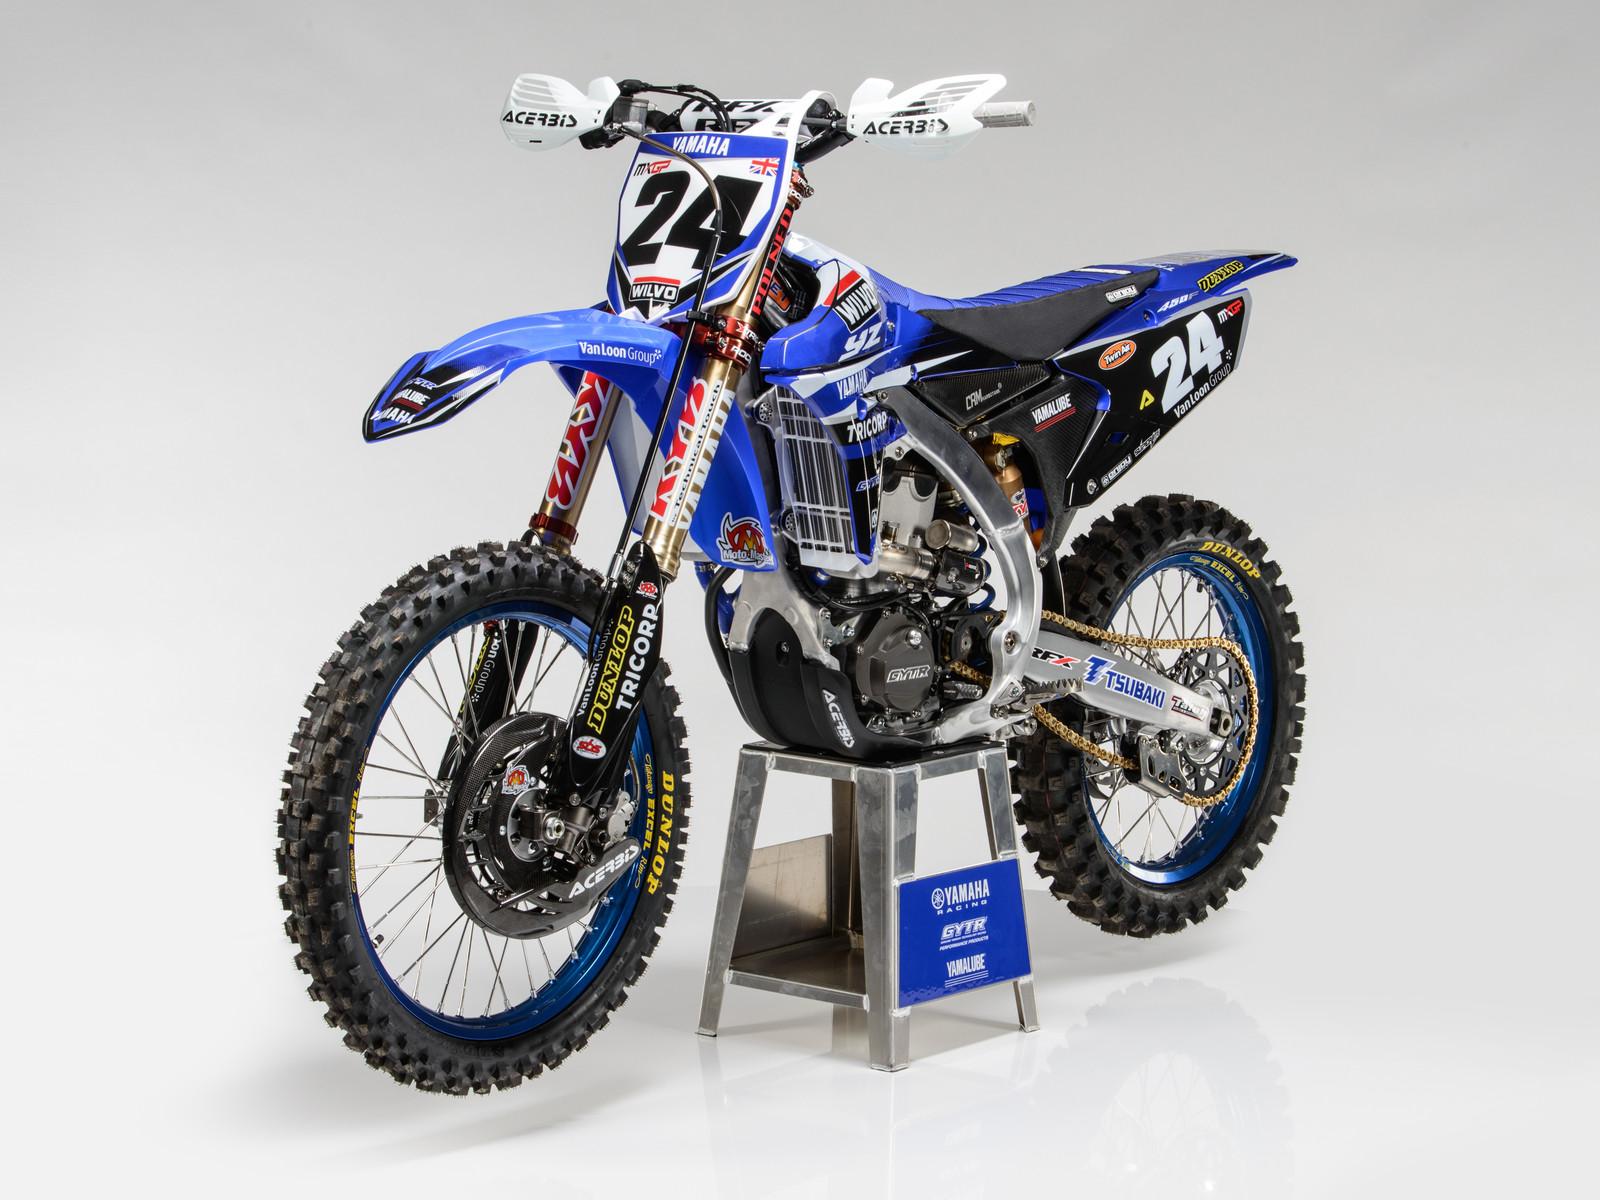 Shaun Simpson's 2017 WILVO Yamaha YZ450FM - First Look: 2017 Monster Energy & Wilvo Yamaha MXGP Teams - Motocross Pictures - Vital MX